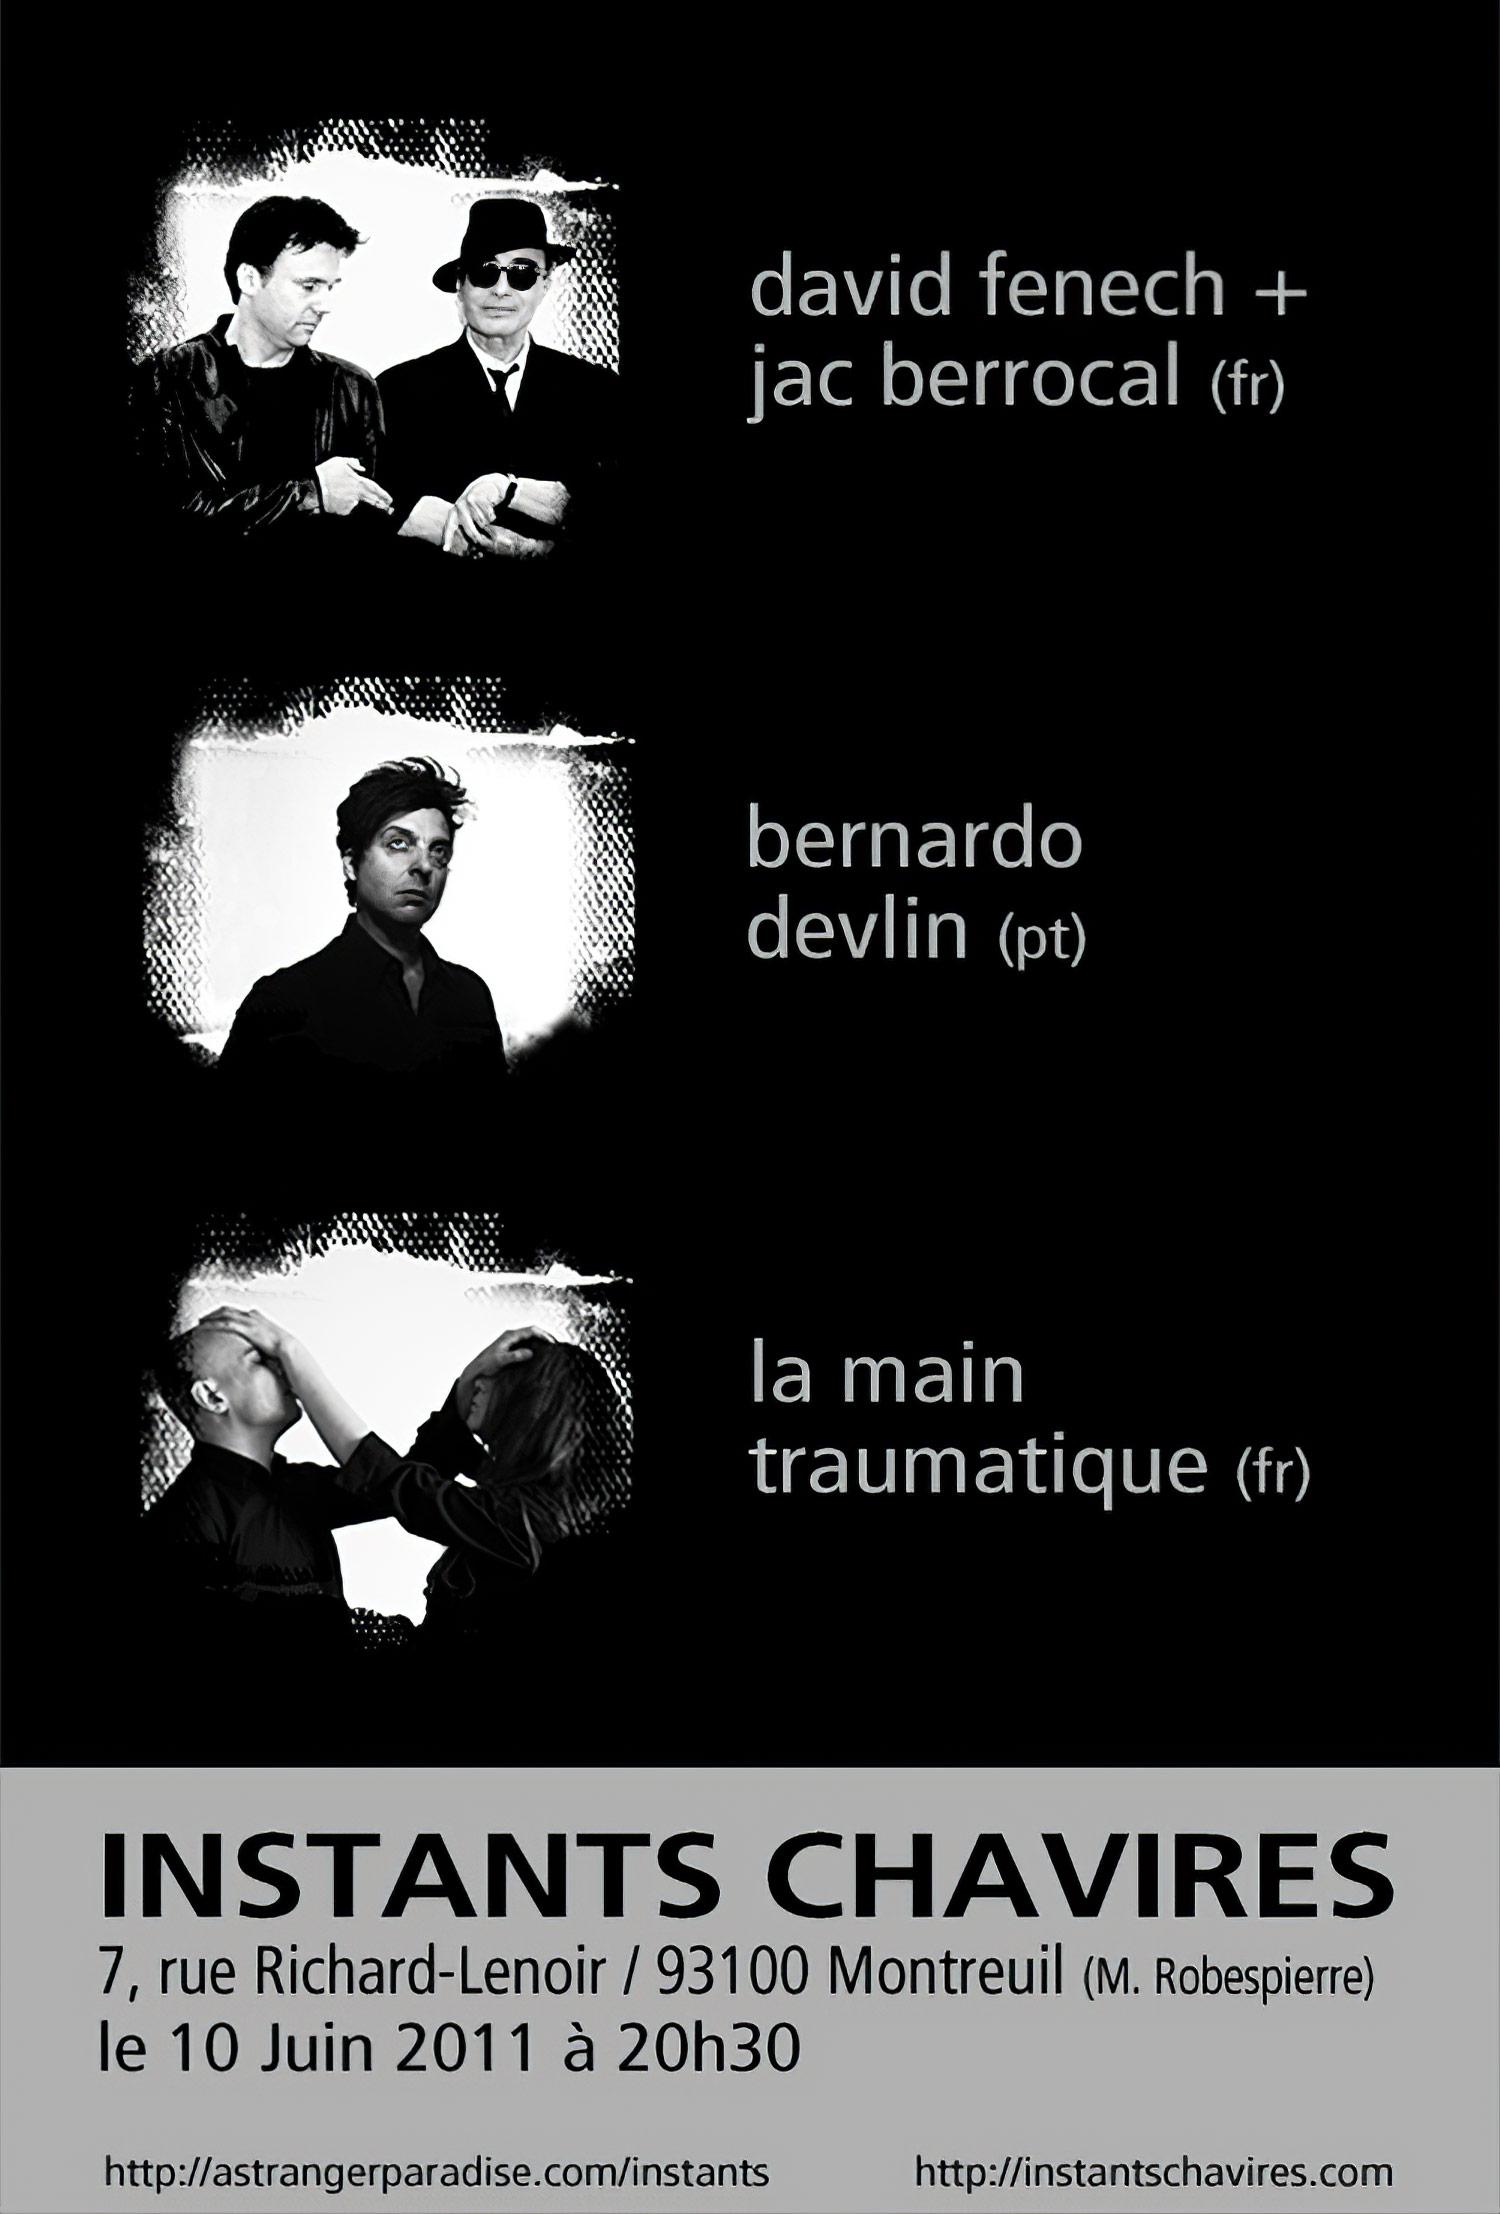 David Fenech + Jac Berrocal, Bernardo Devlin, La Main Traumatique : 10 juin 2011 aux Instants Chavirés